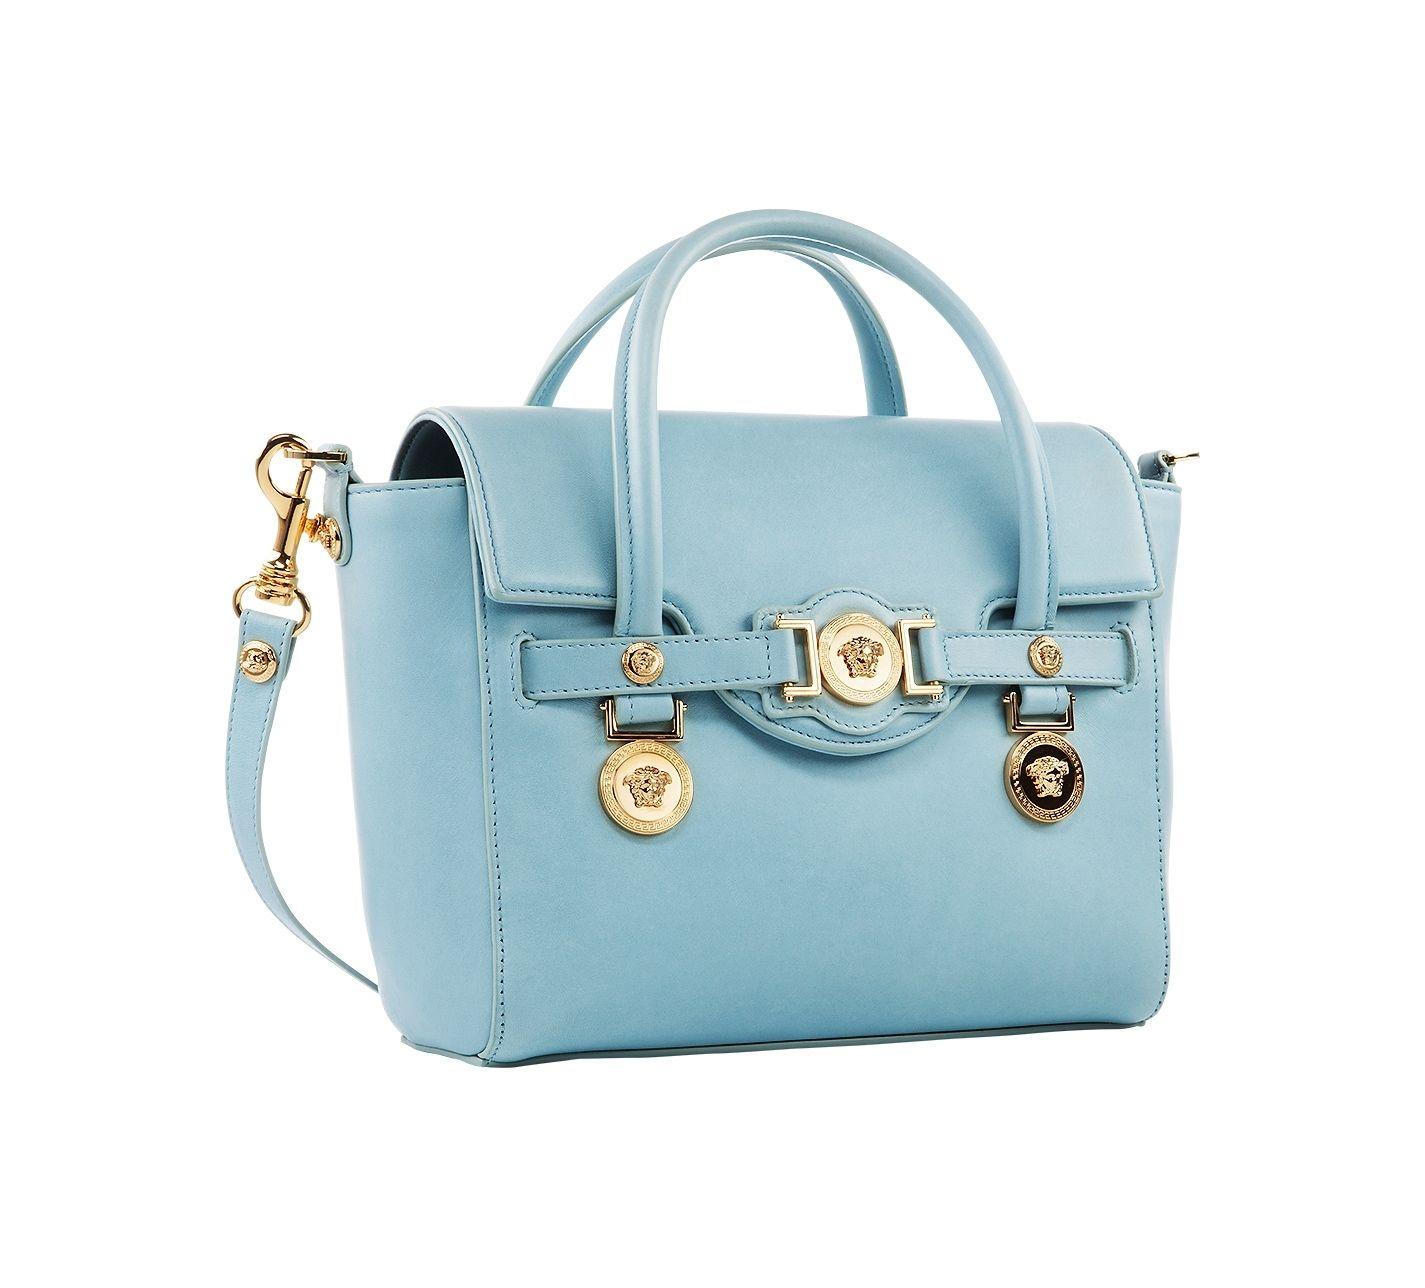 A small light blus Signature bag. #VesraceSignatureBag